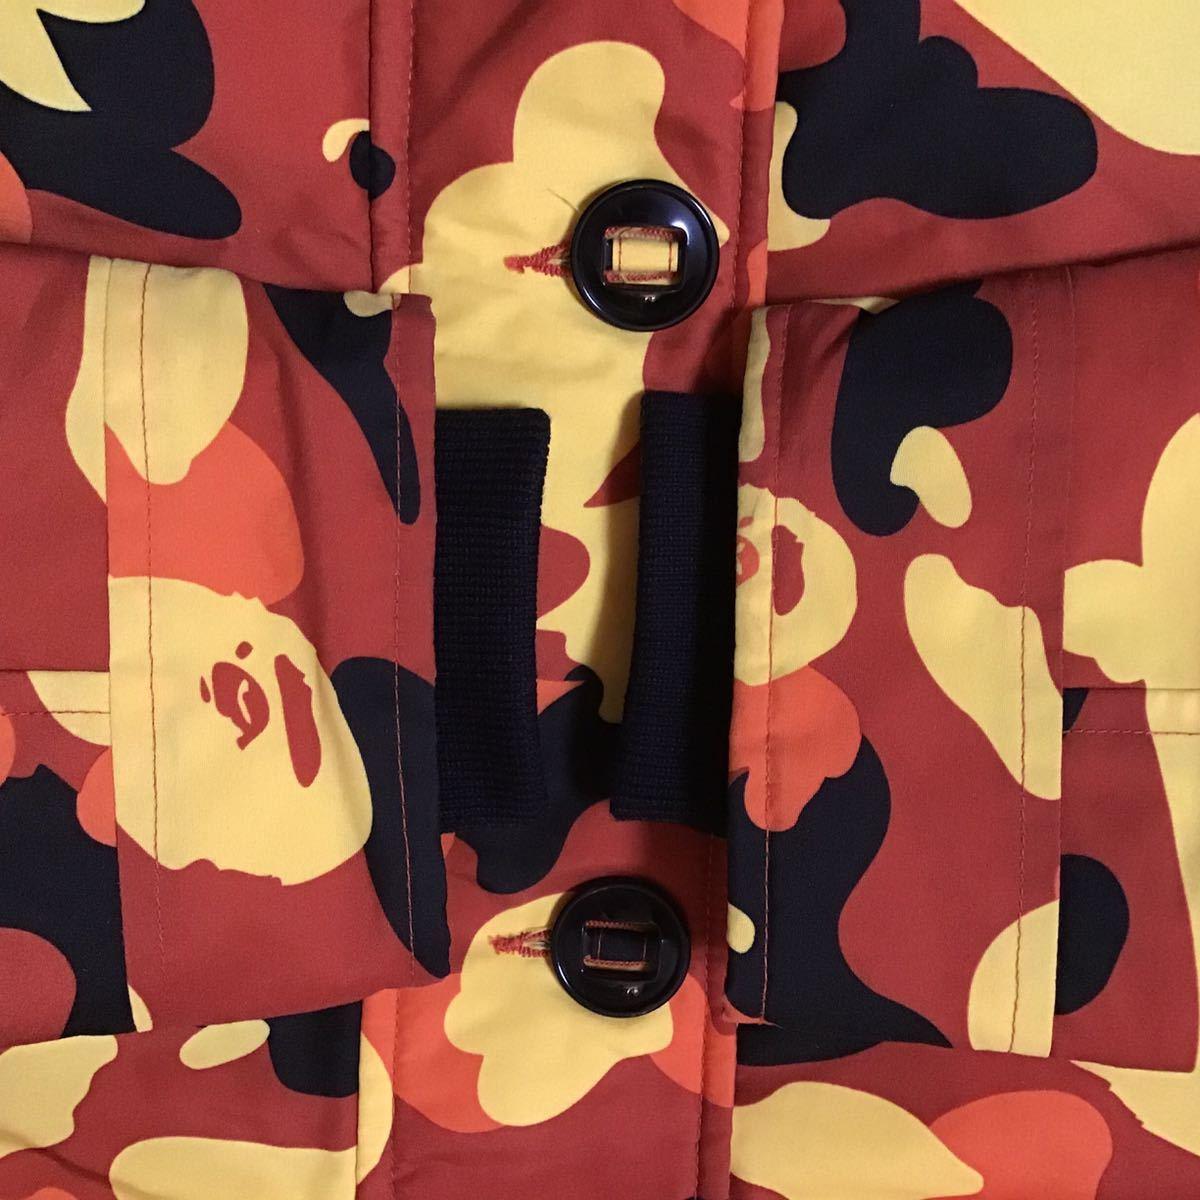 orange camo fur hoodie down jacket Sサイズ a bathing ape bape ダウンジャケット エイプ ベイプ アベイシングエイプ 迷彩 3623